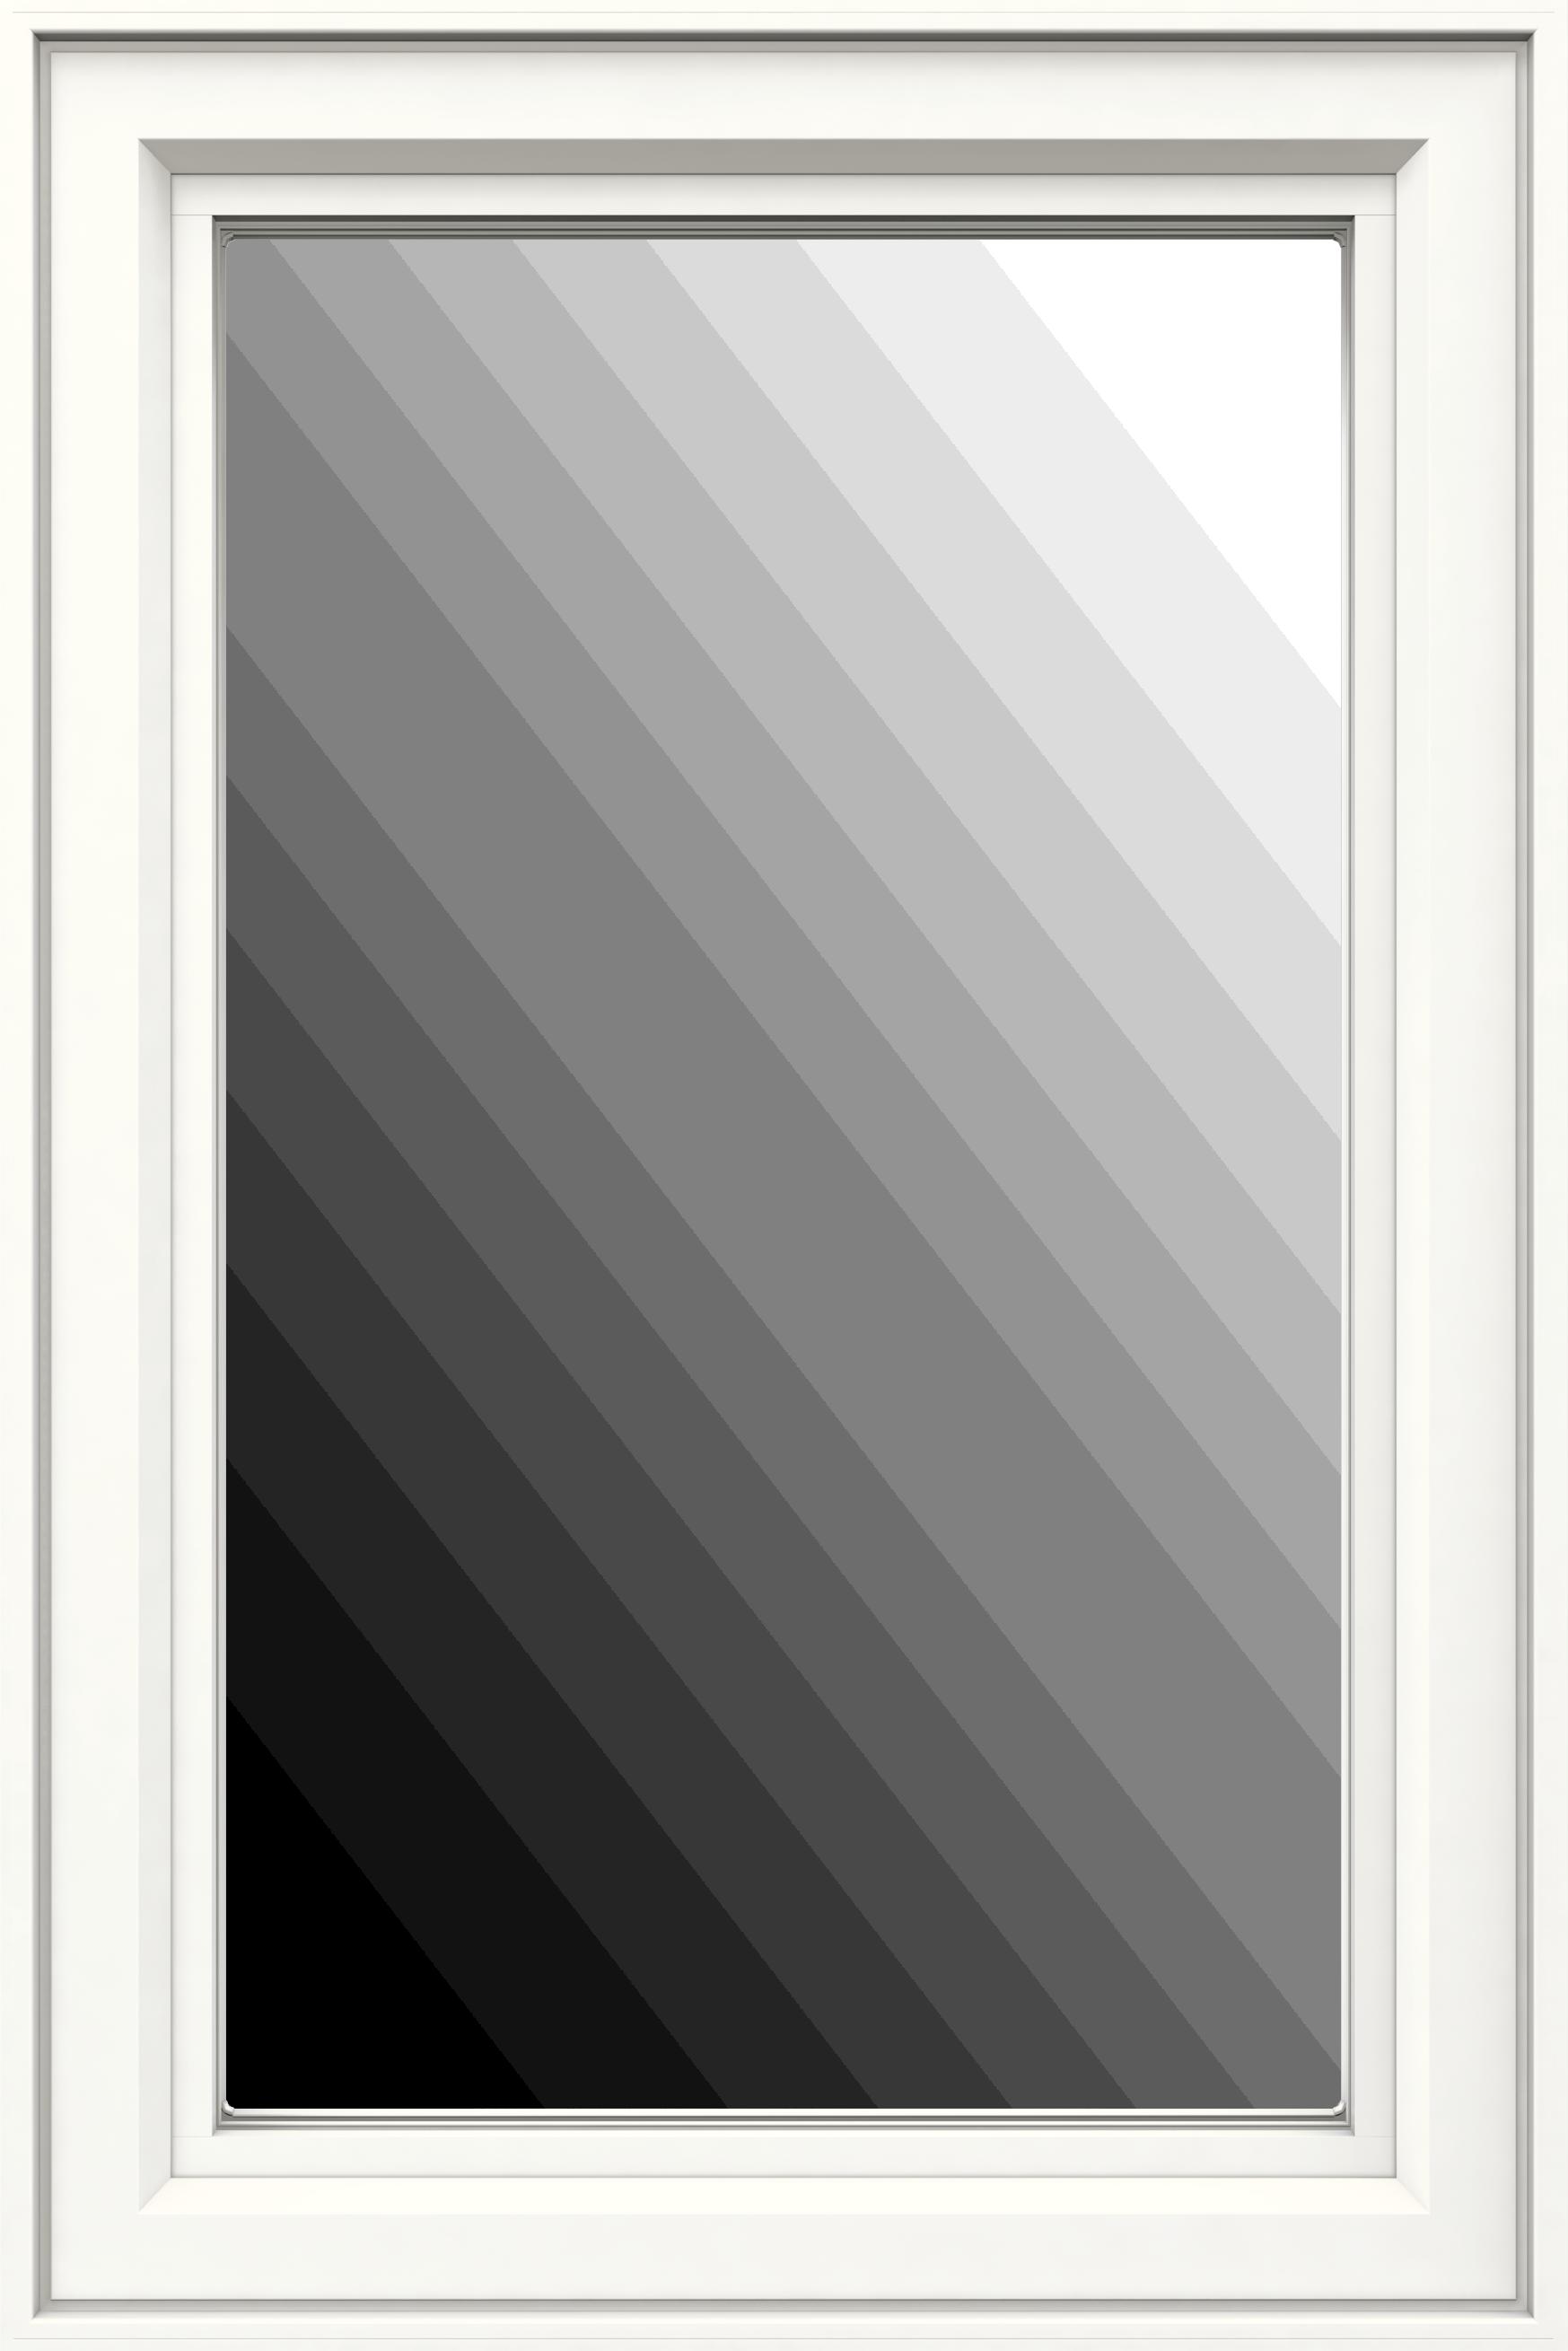 Jeld-Wen Premium Vinyl Casement Windows in white with no grille.